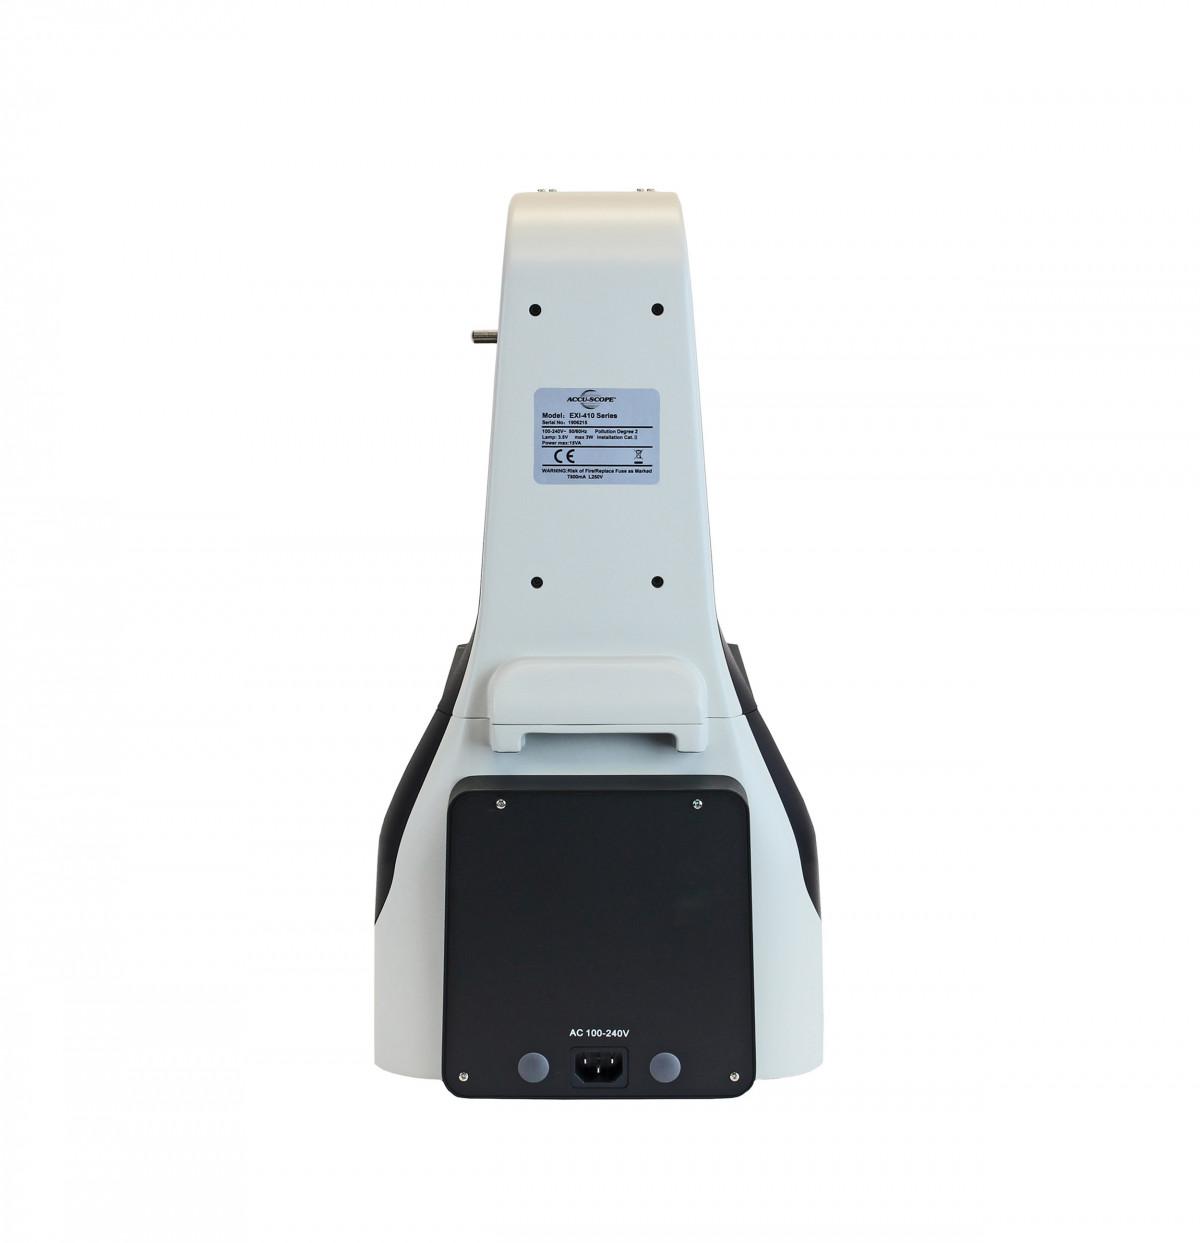 EXI-410-FL, rear view showing fluorescence LED module housing